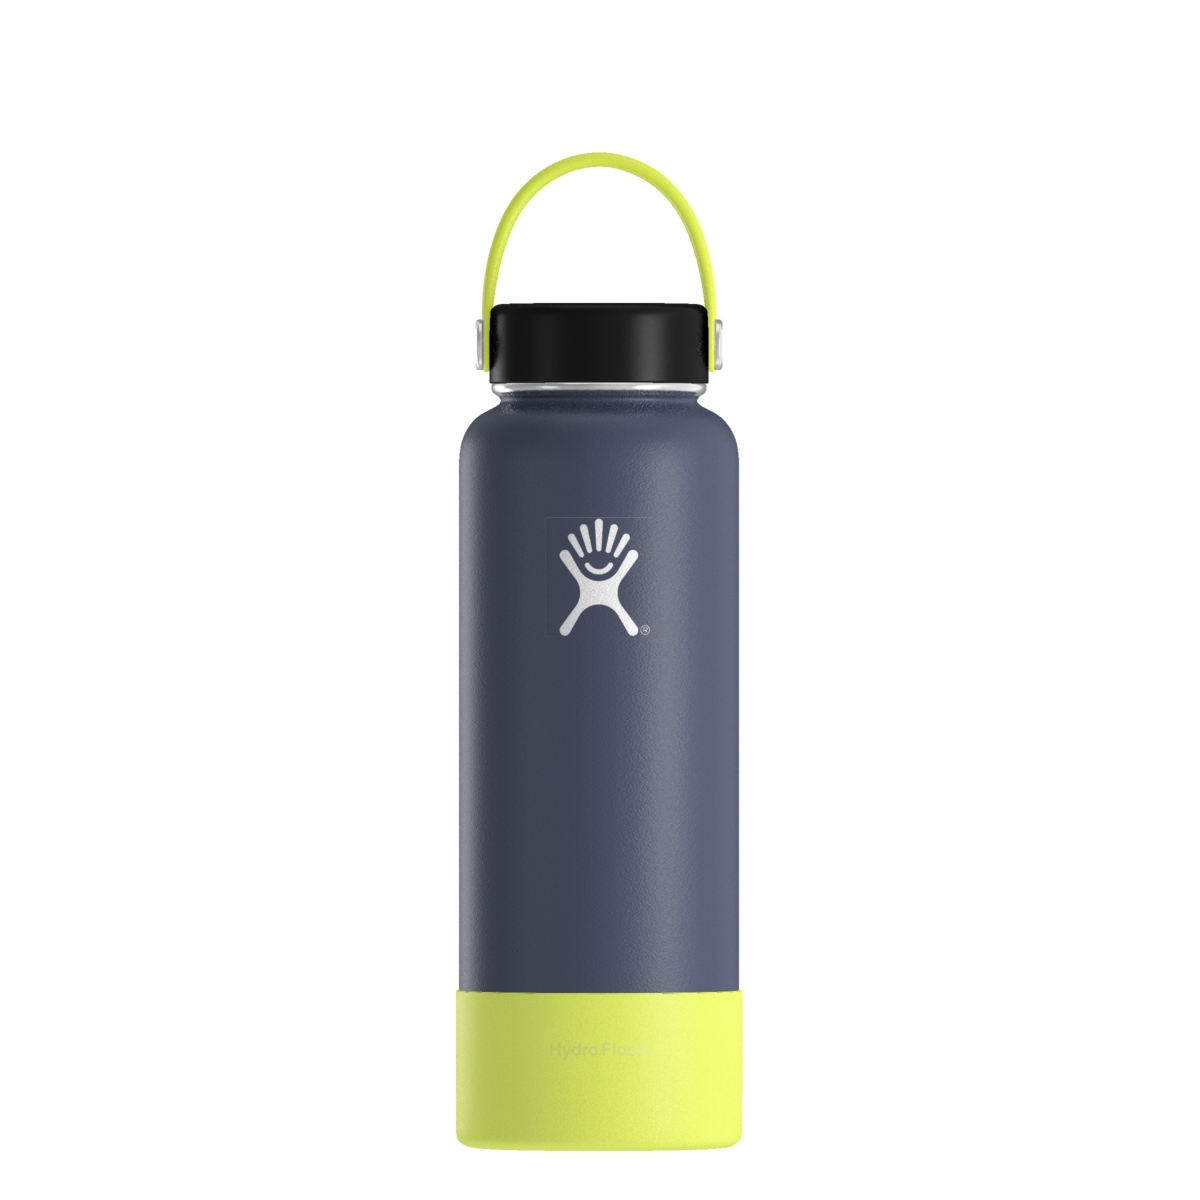 My Hydro By Hydro Flask 40oz Flex Cap Strap Citron Cap Black Bottle Cobalt Boot Citron Hydroflask Custom Hydro Flask Flask